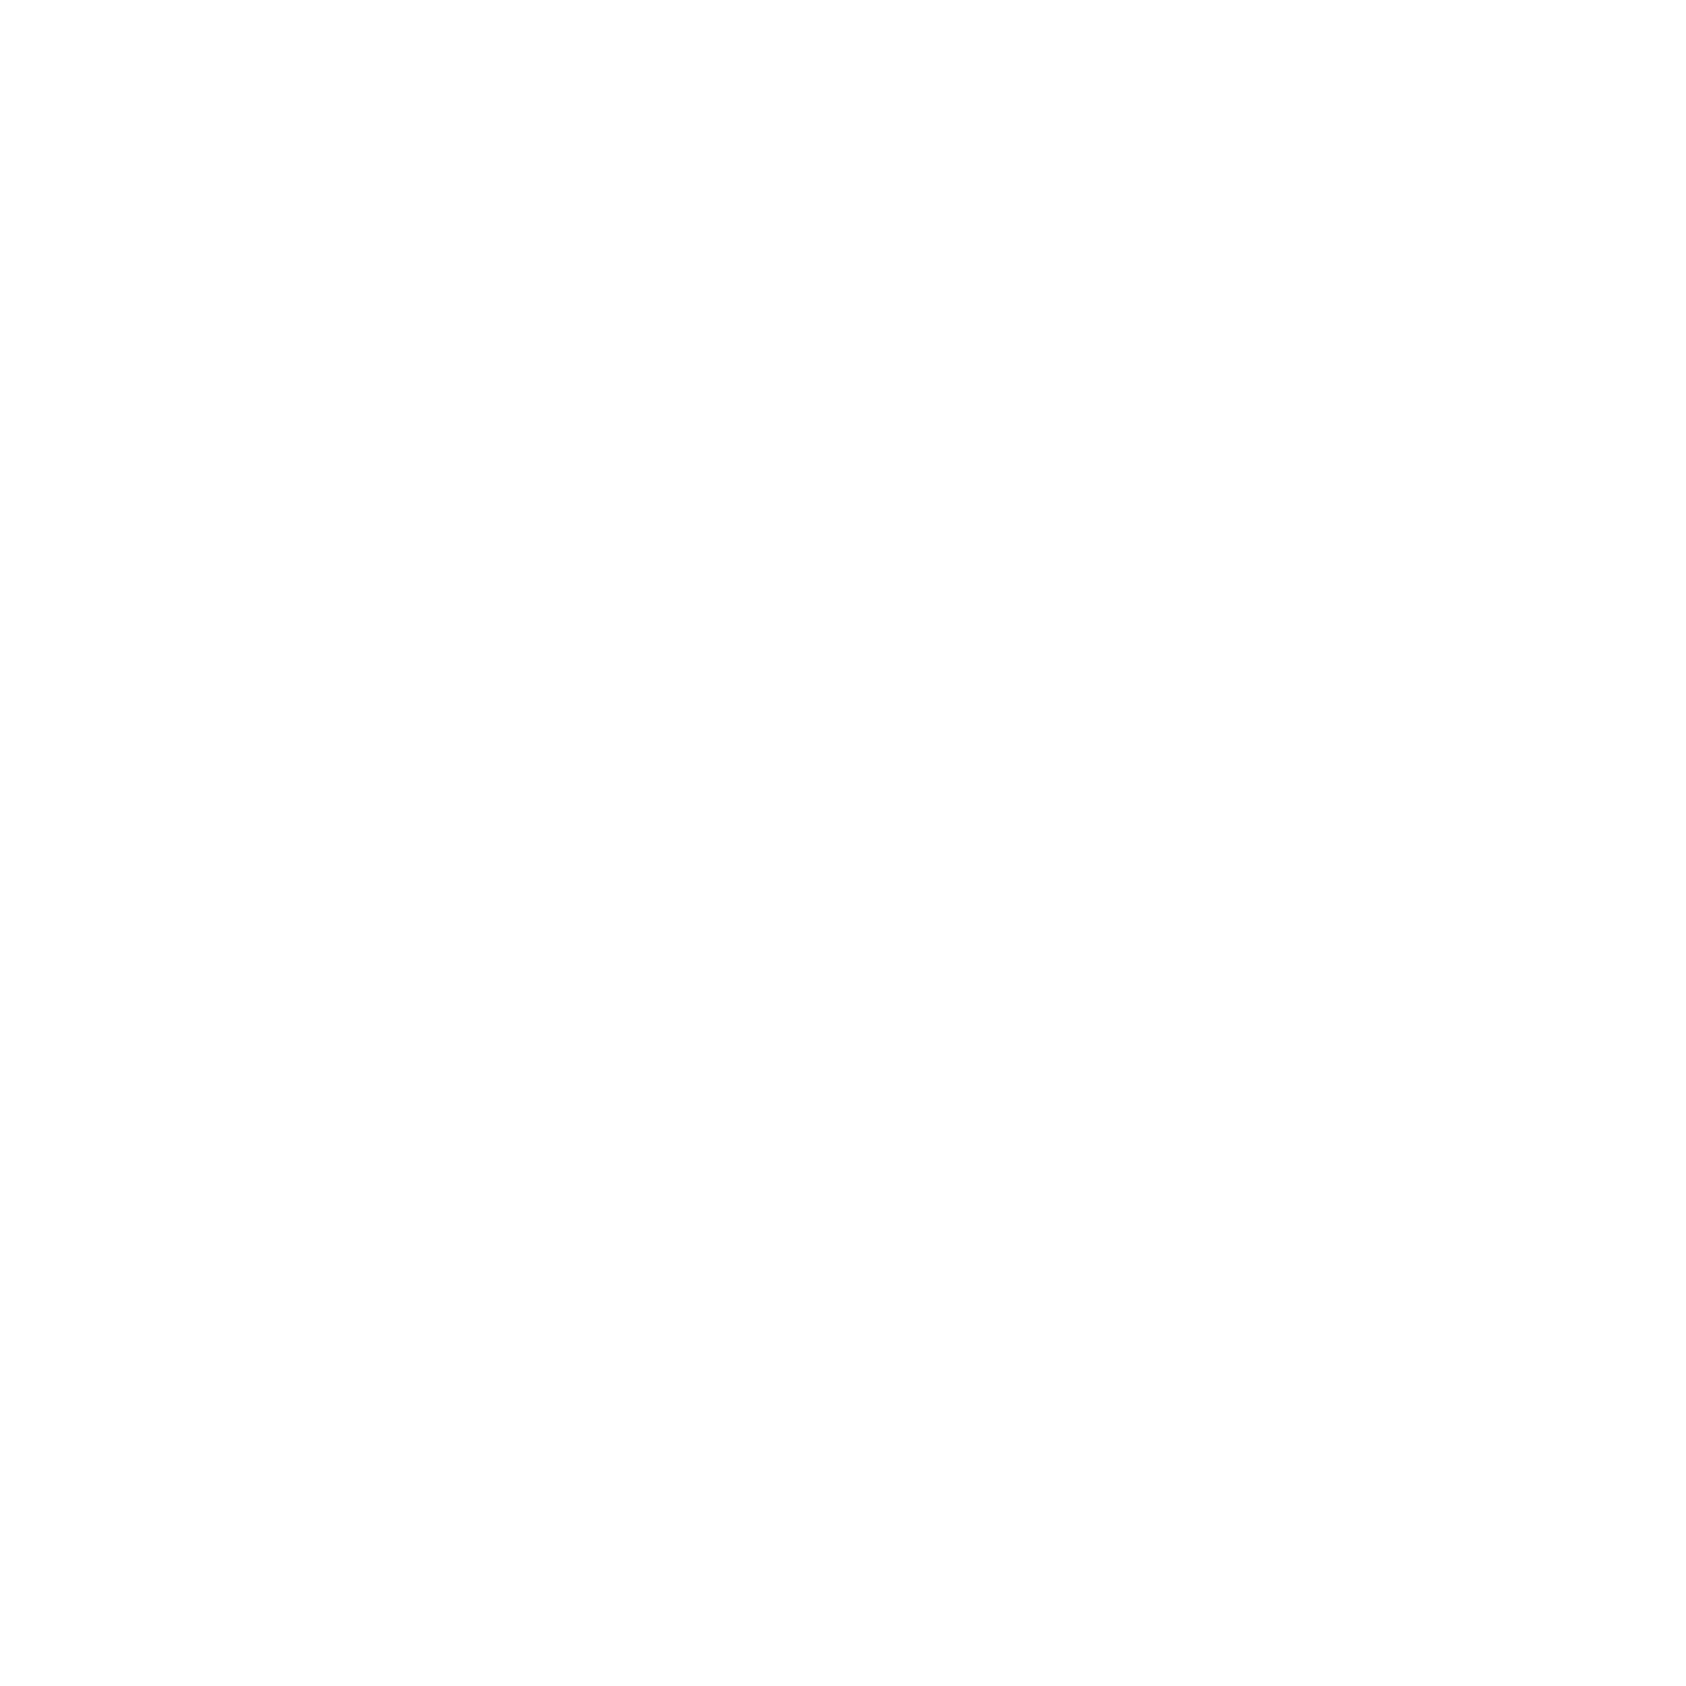 Згромадження Сестер Пресвятої Родини - ЗСПР - Congregation of the Sisters of the Holy Family